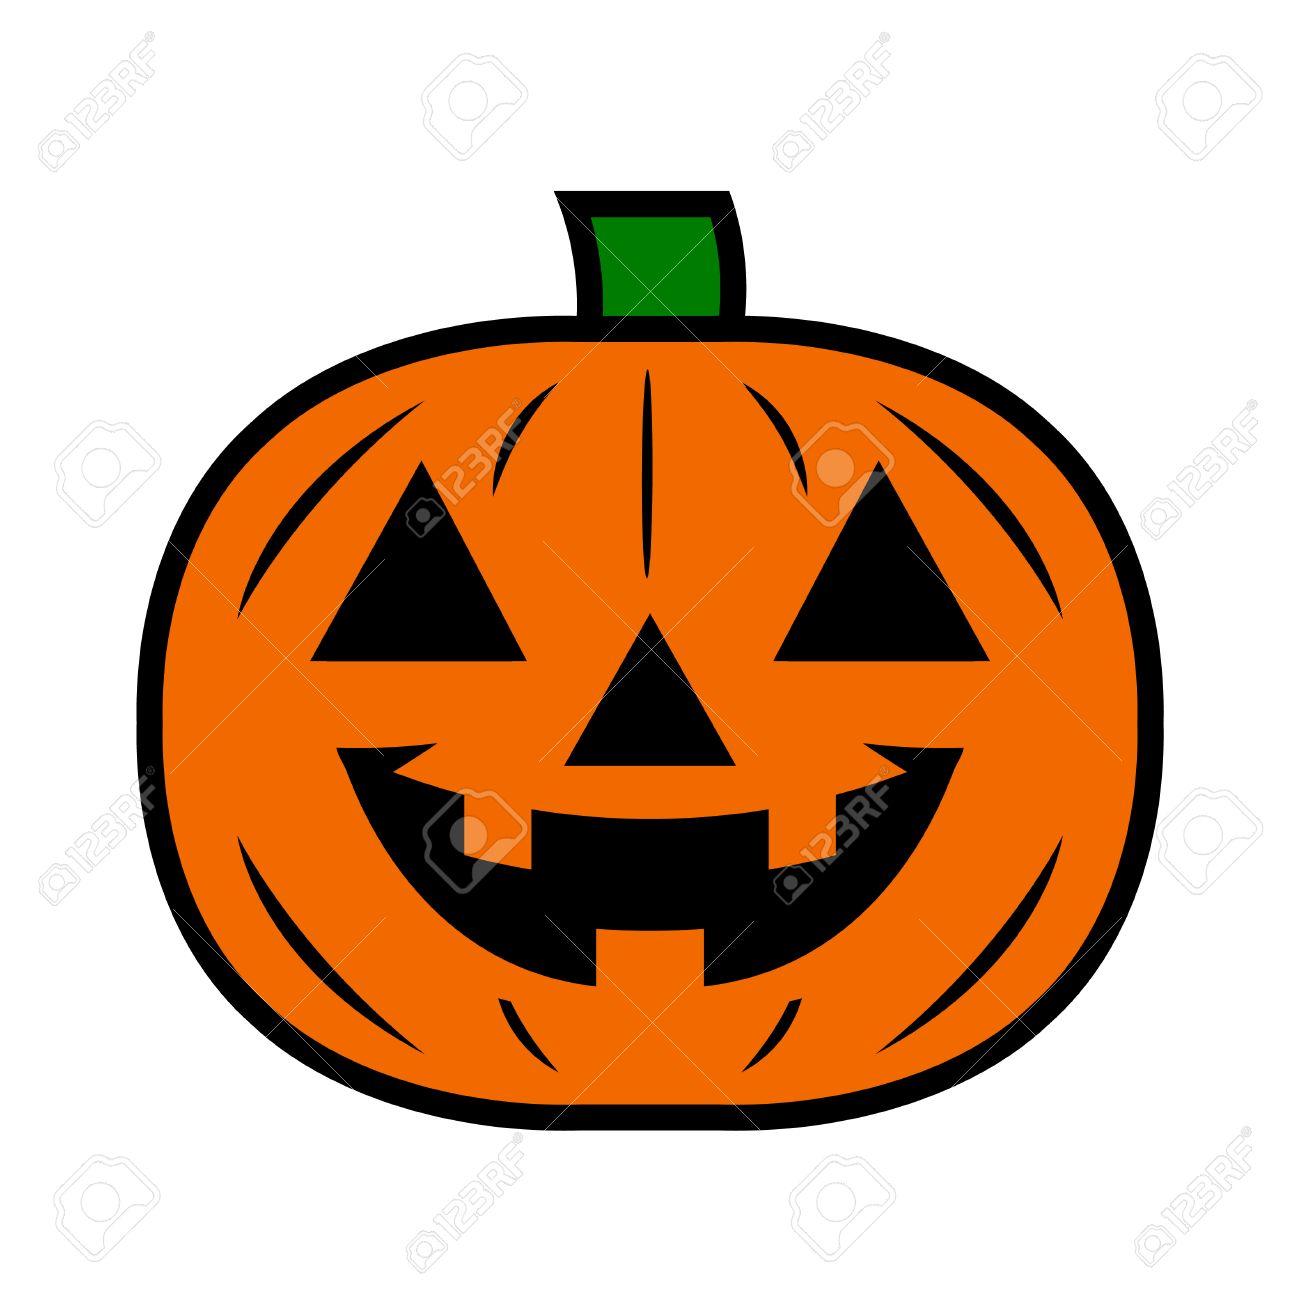 jack o lantern pumpkin vector icon royalty free cliparts vectors rh 123rf com halloween jack o lantern clipart pumpkin jack o lantern clipart